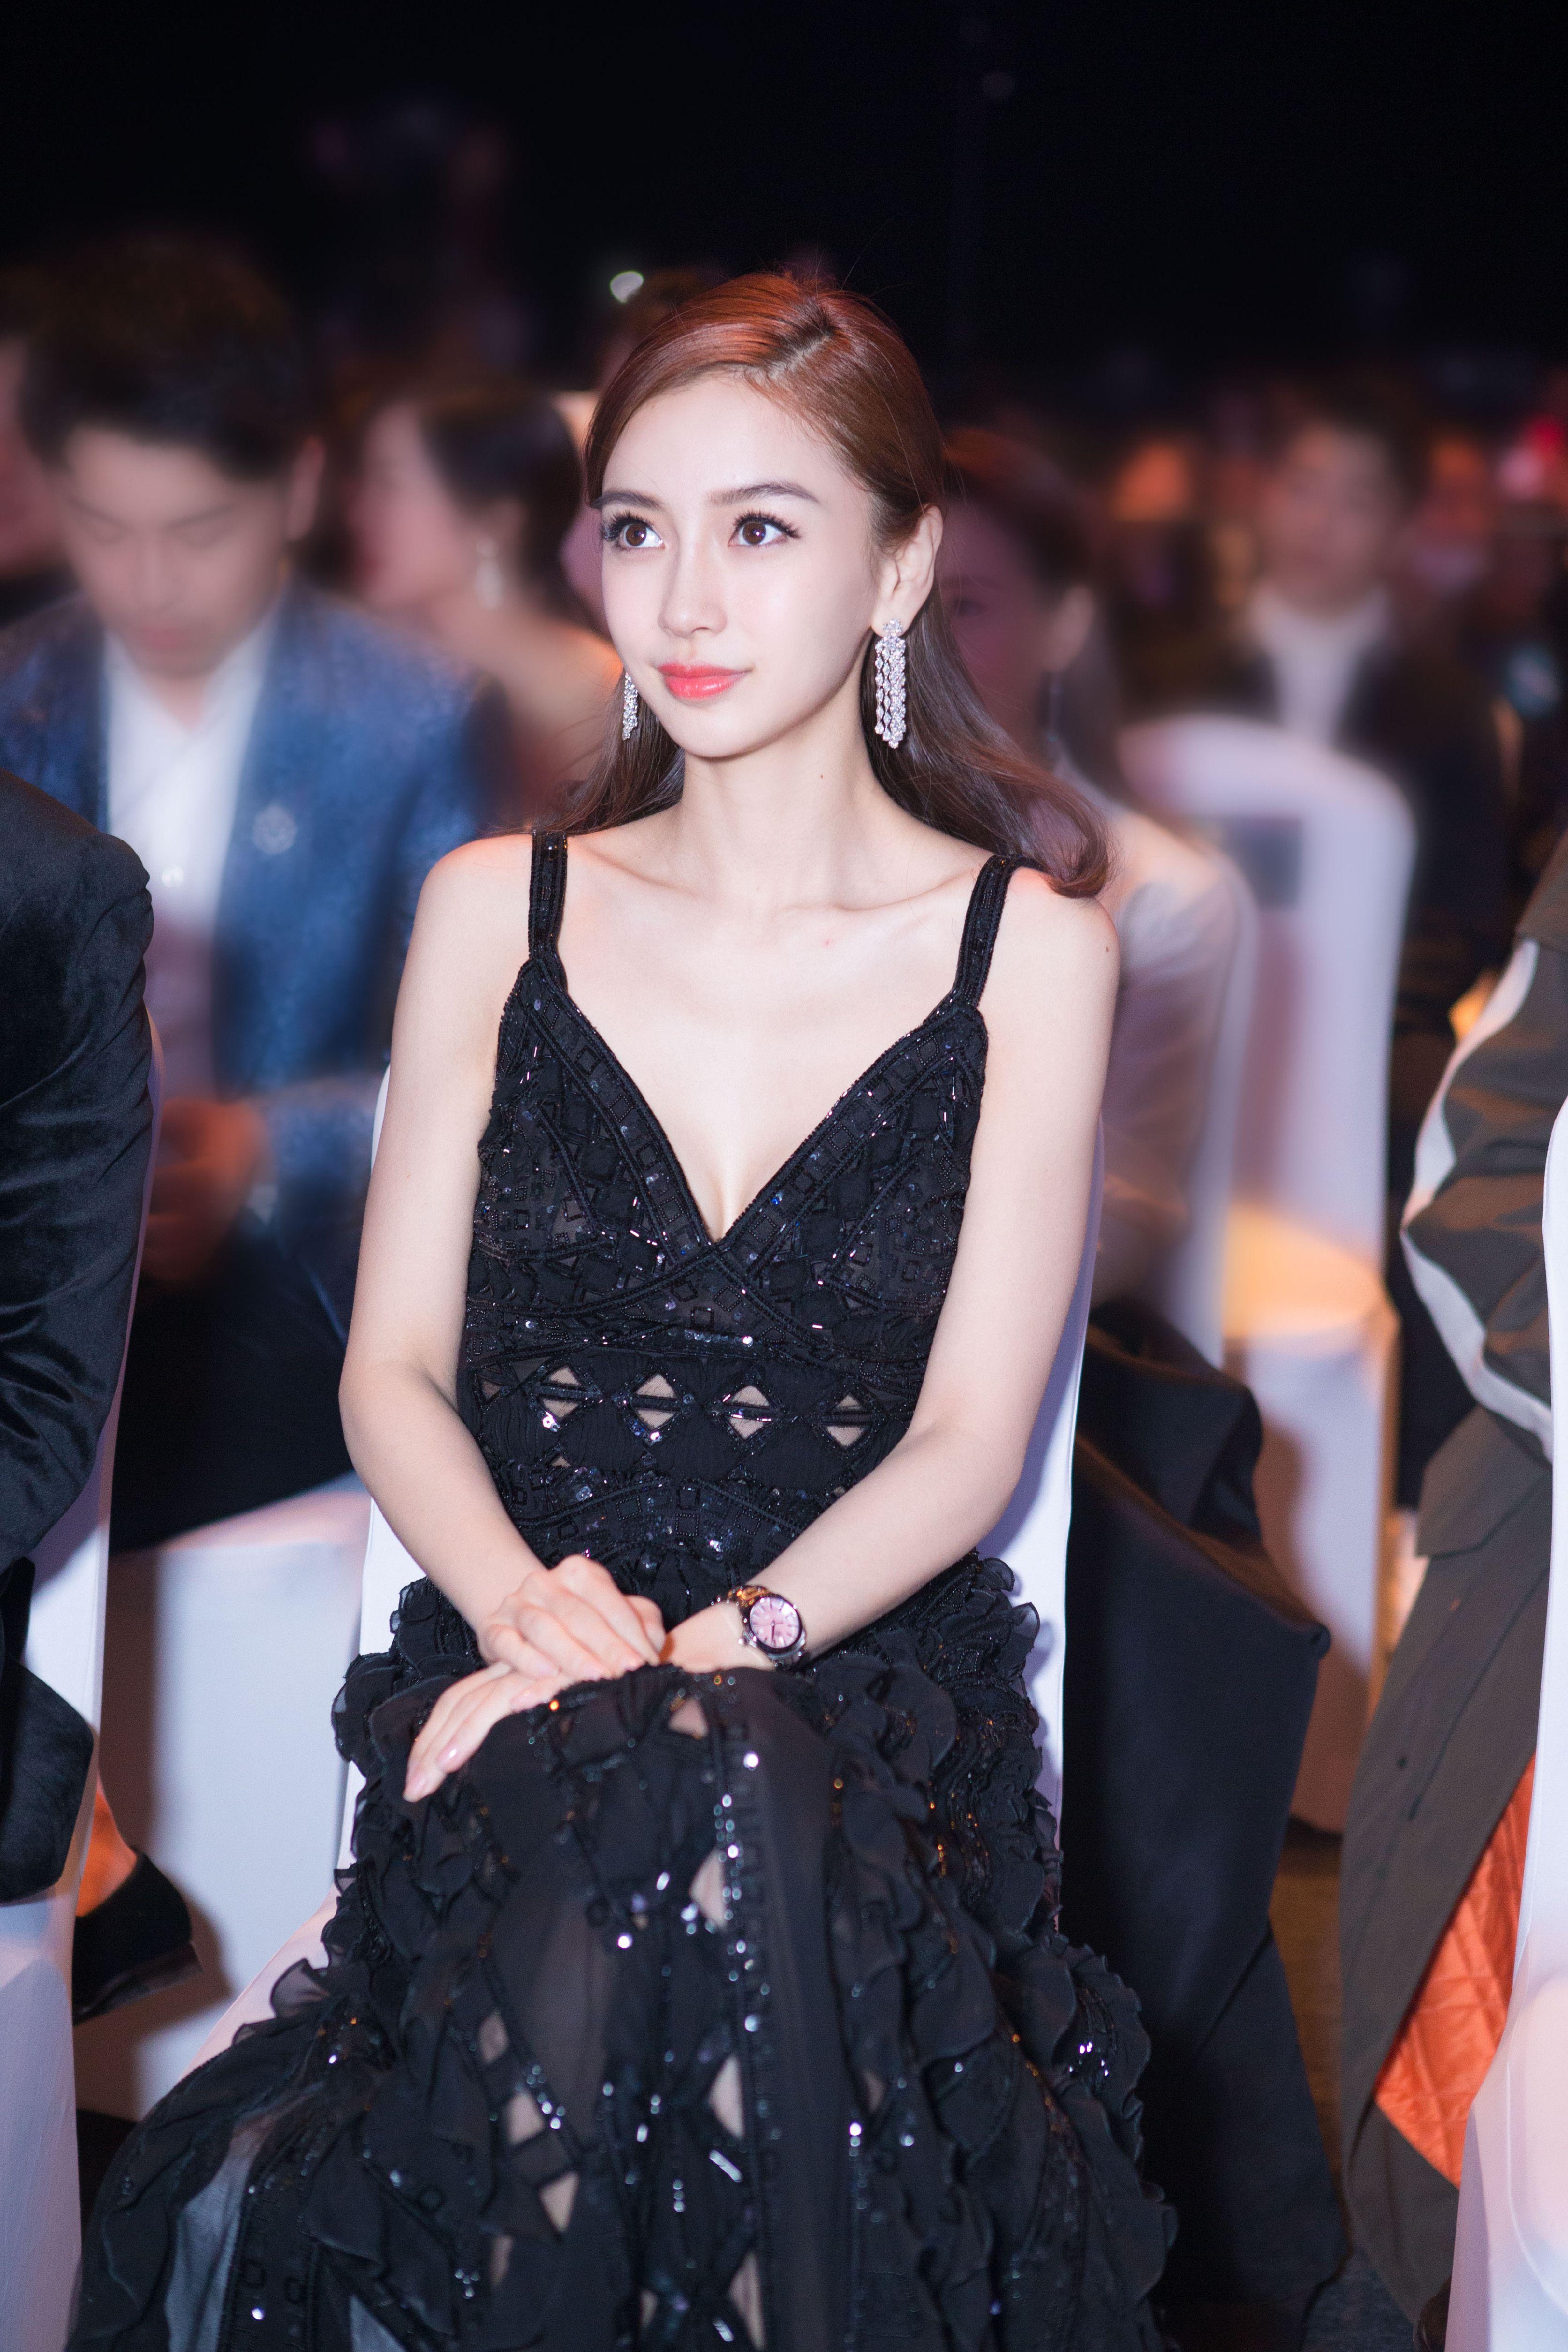 AngelaBaby 杨颖 」おしゃれまとめの人気アイデア|Pinterest|Kat DeLune